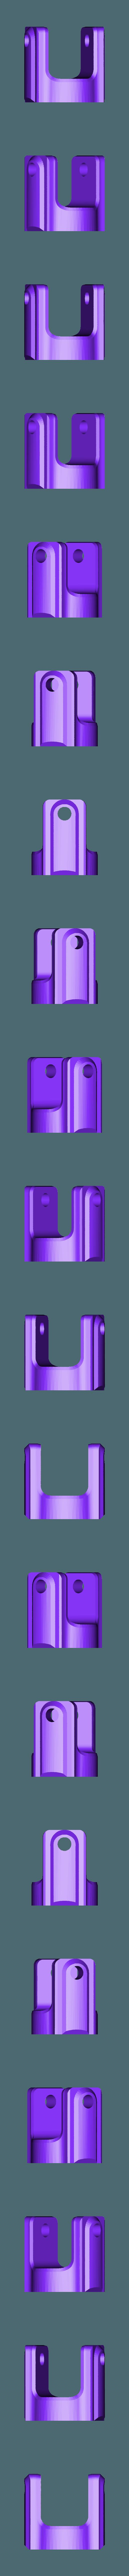 TruckV3_Axle_front_shaft_Ujoint_A.STL Download STL file 3D Printed RC Truck V3 • 3D print model, MrCrankyface